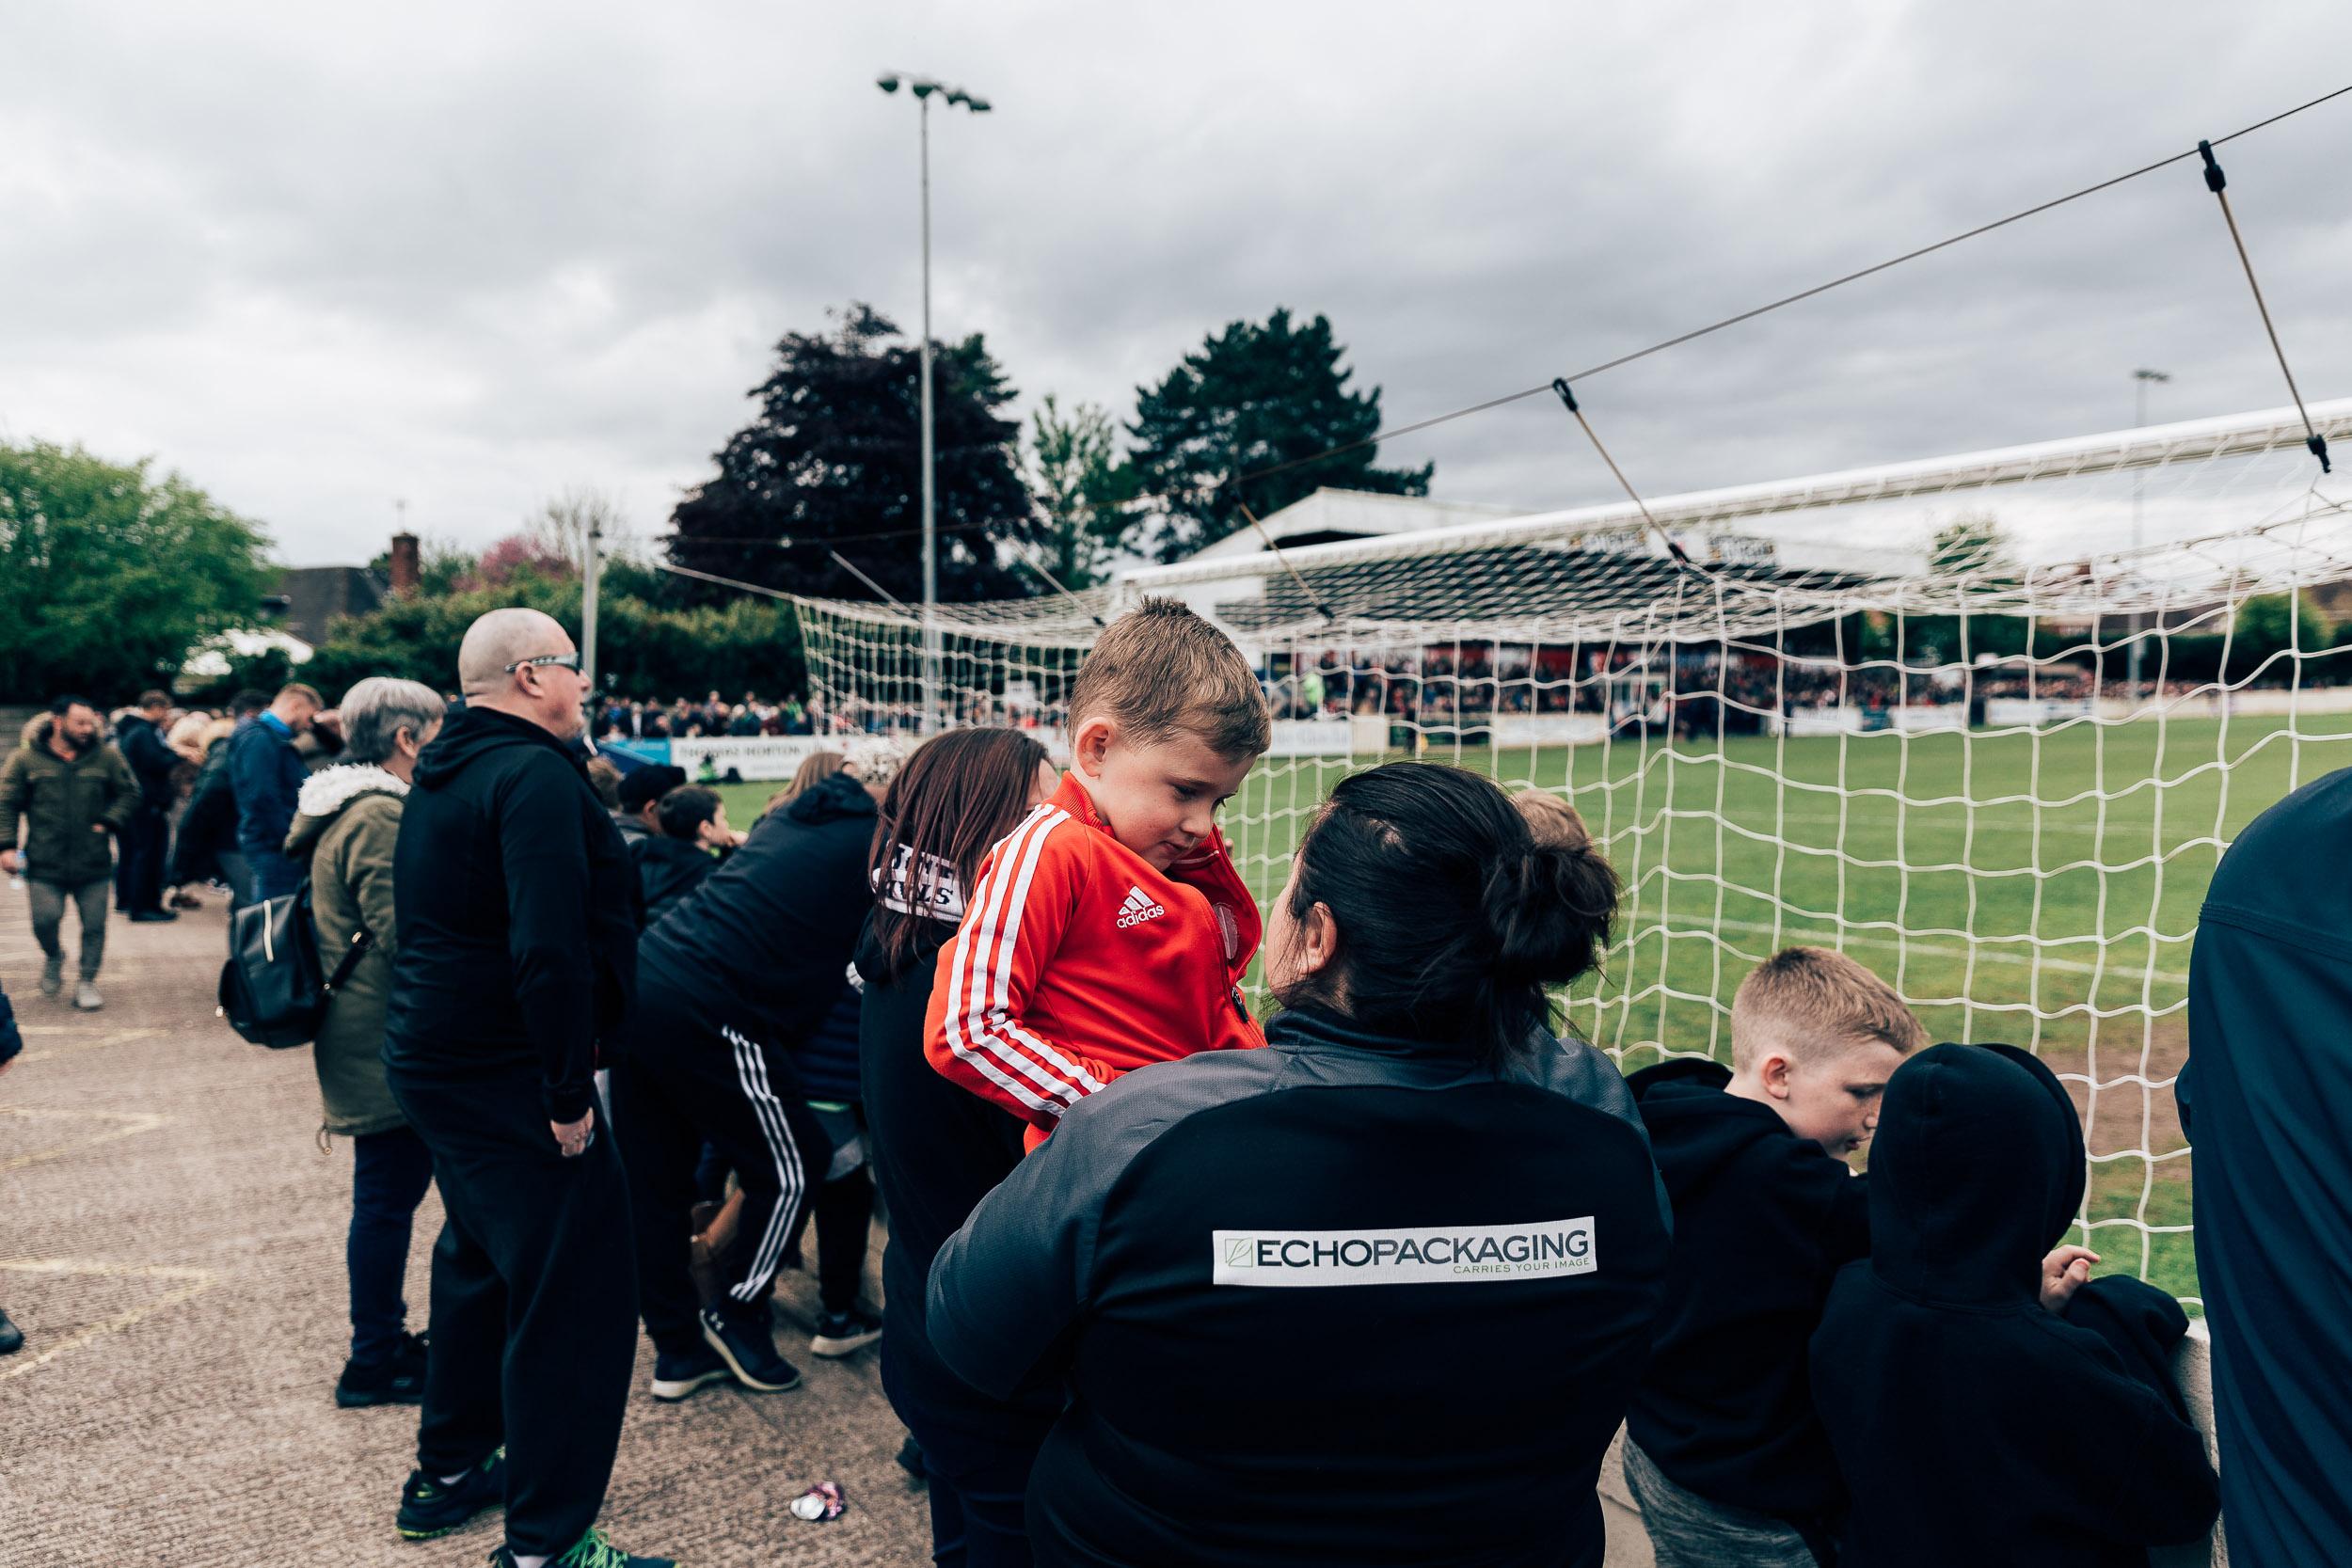 06_05_2019_Bromsgrove_Sporting_Corby-147.jpg